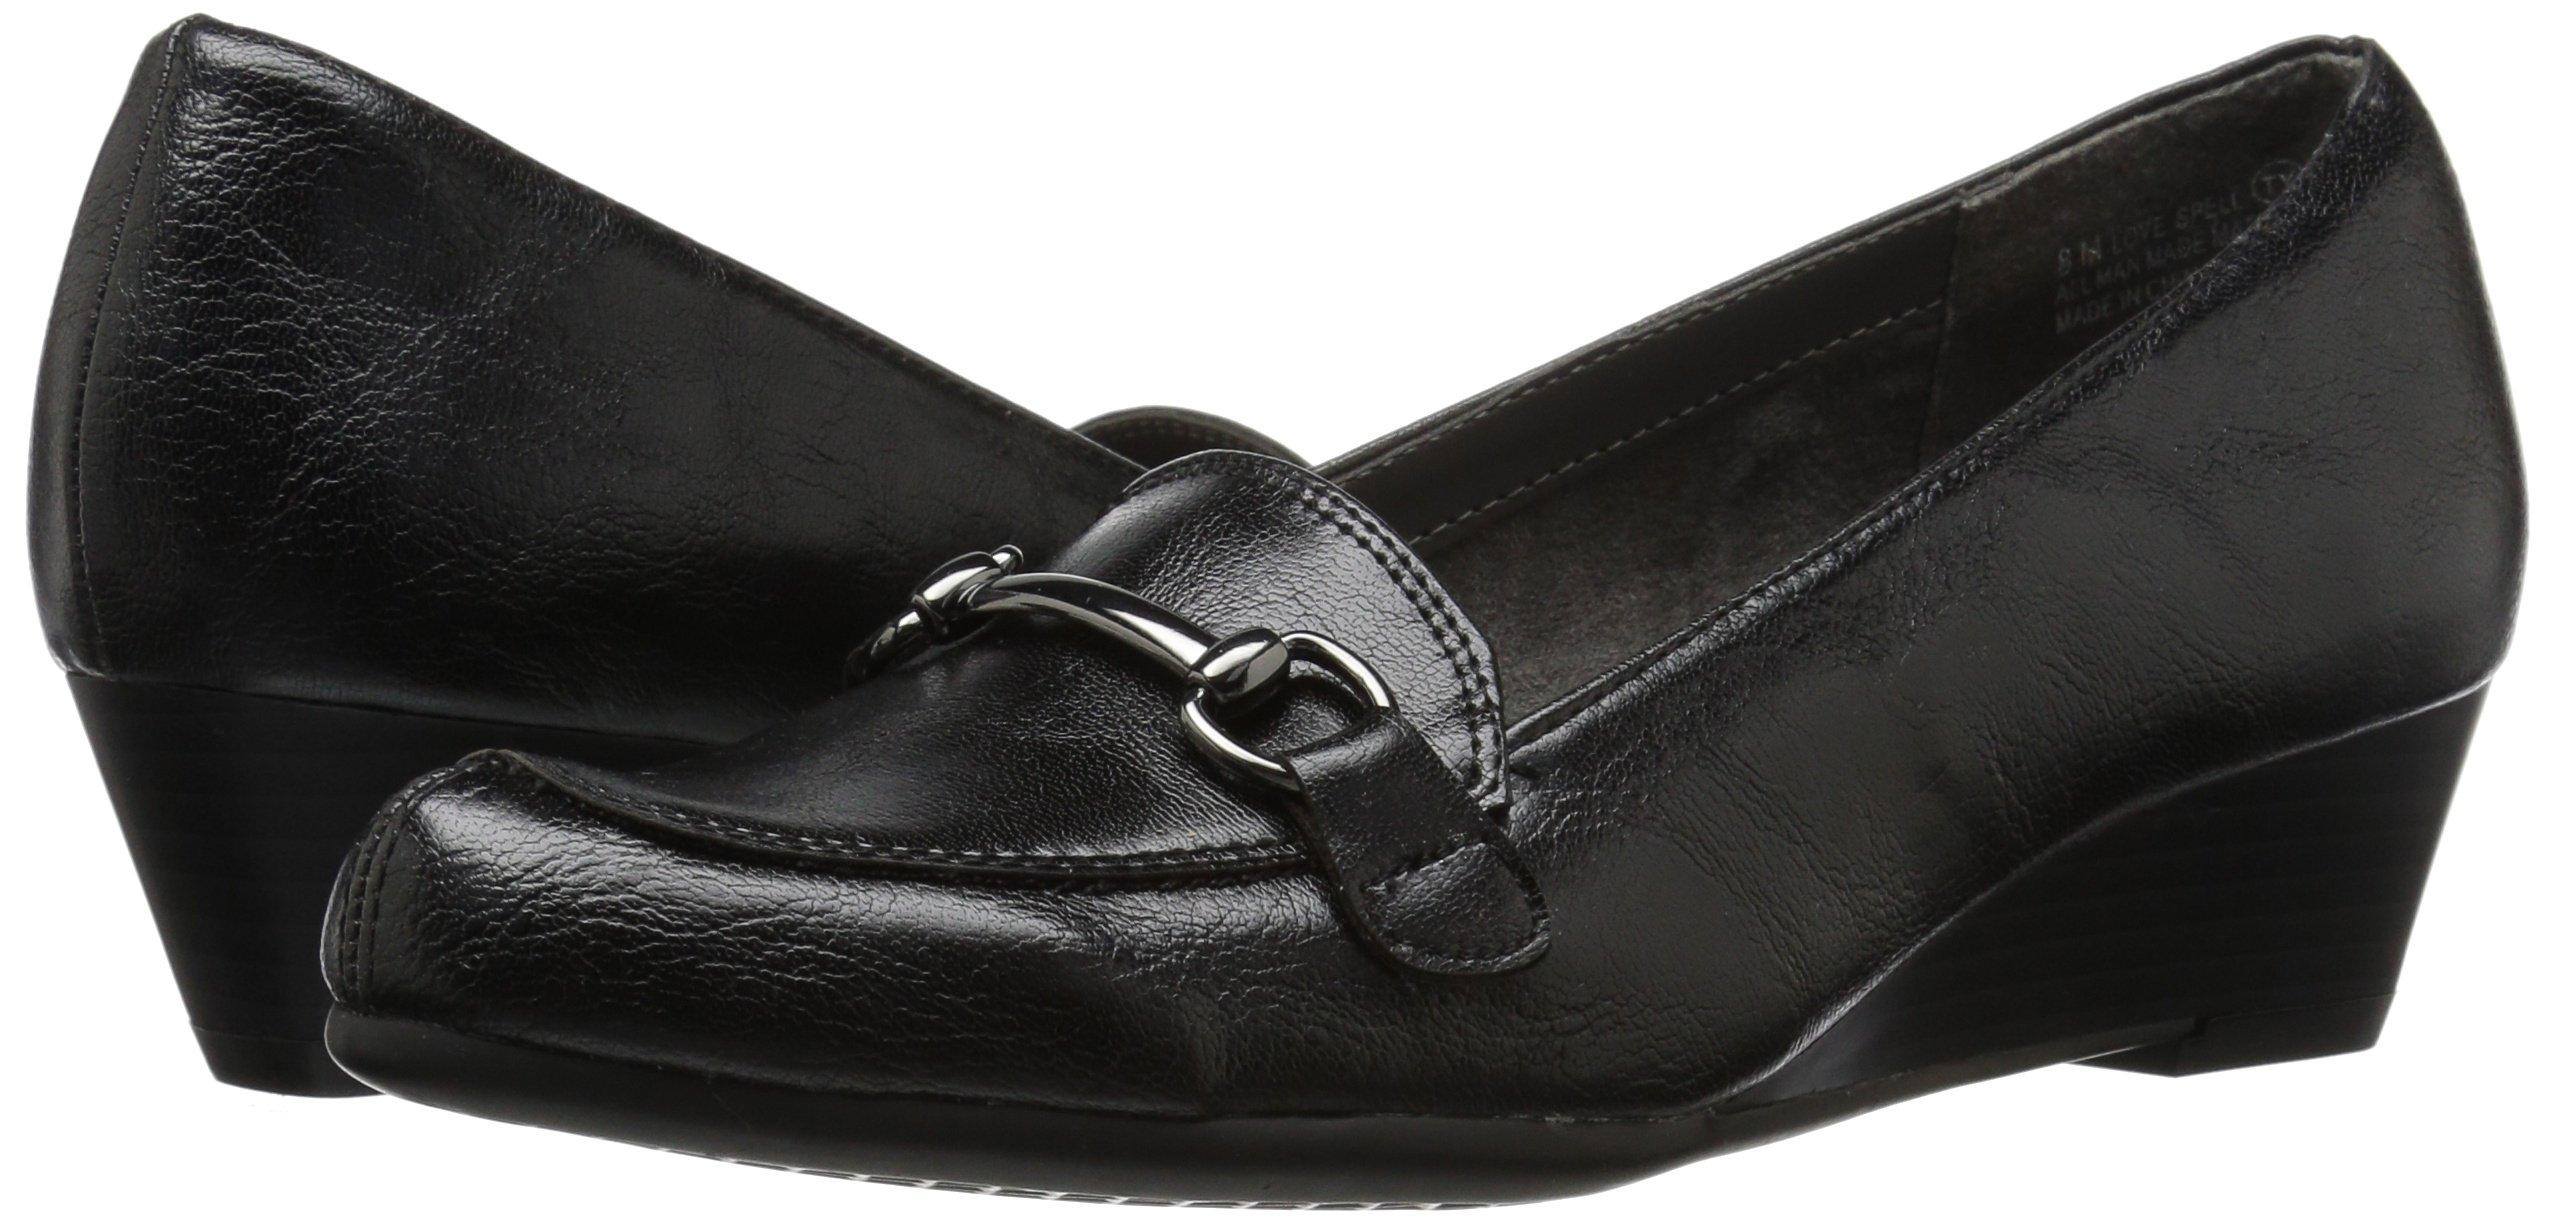 Aerosoles A2 by Women's Love Spell Slip-on Loafer, Black, 8 M US by Aerosoles (Image #6)